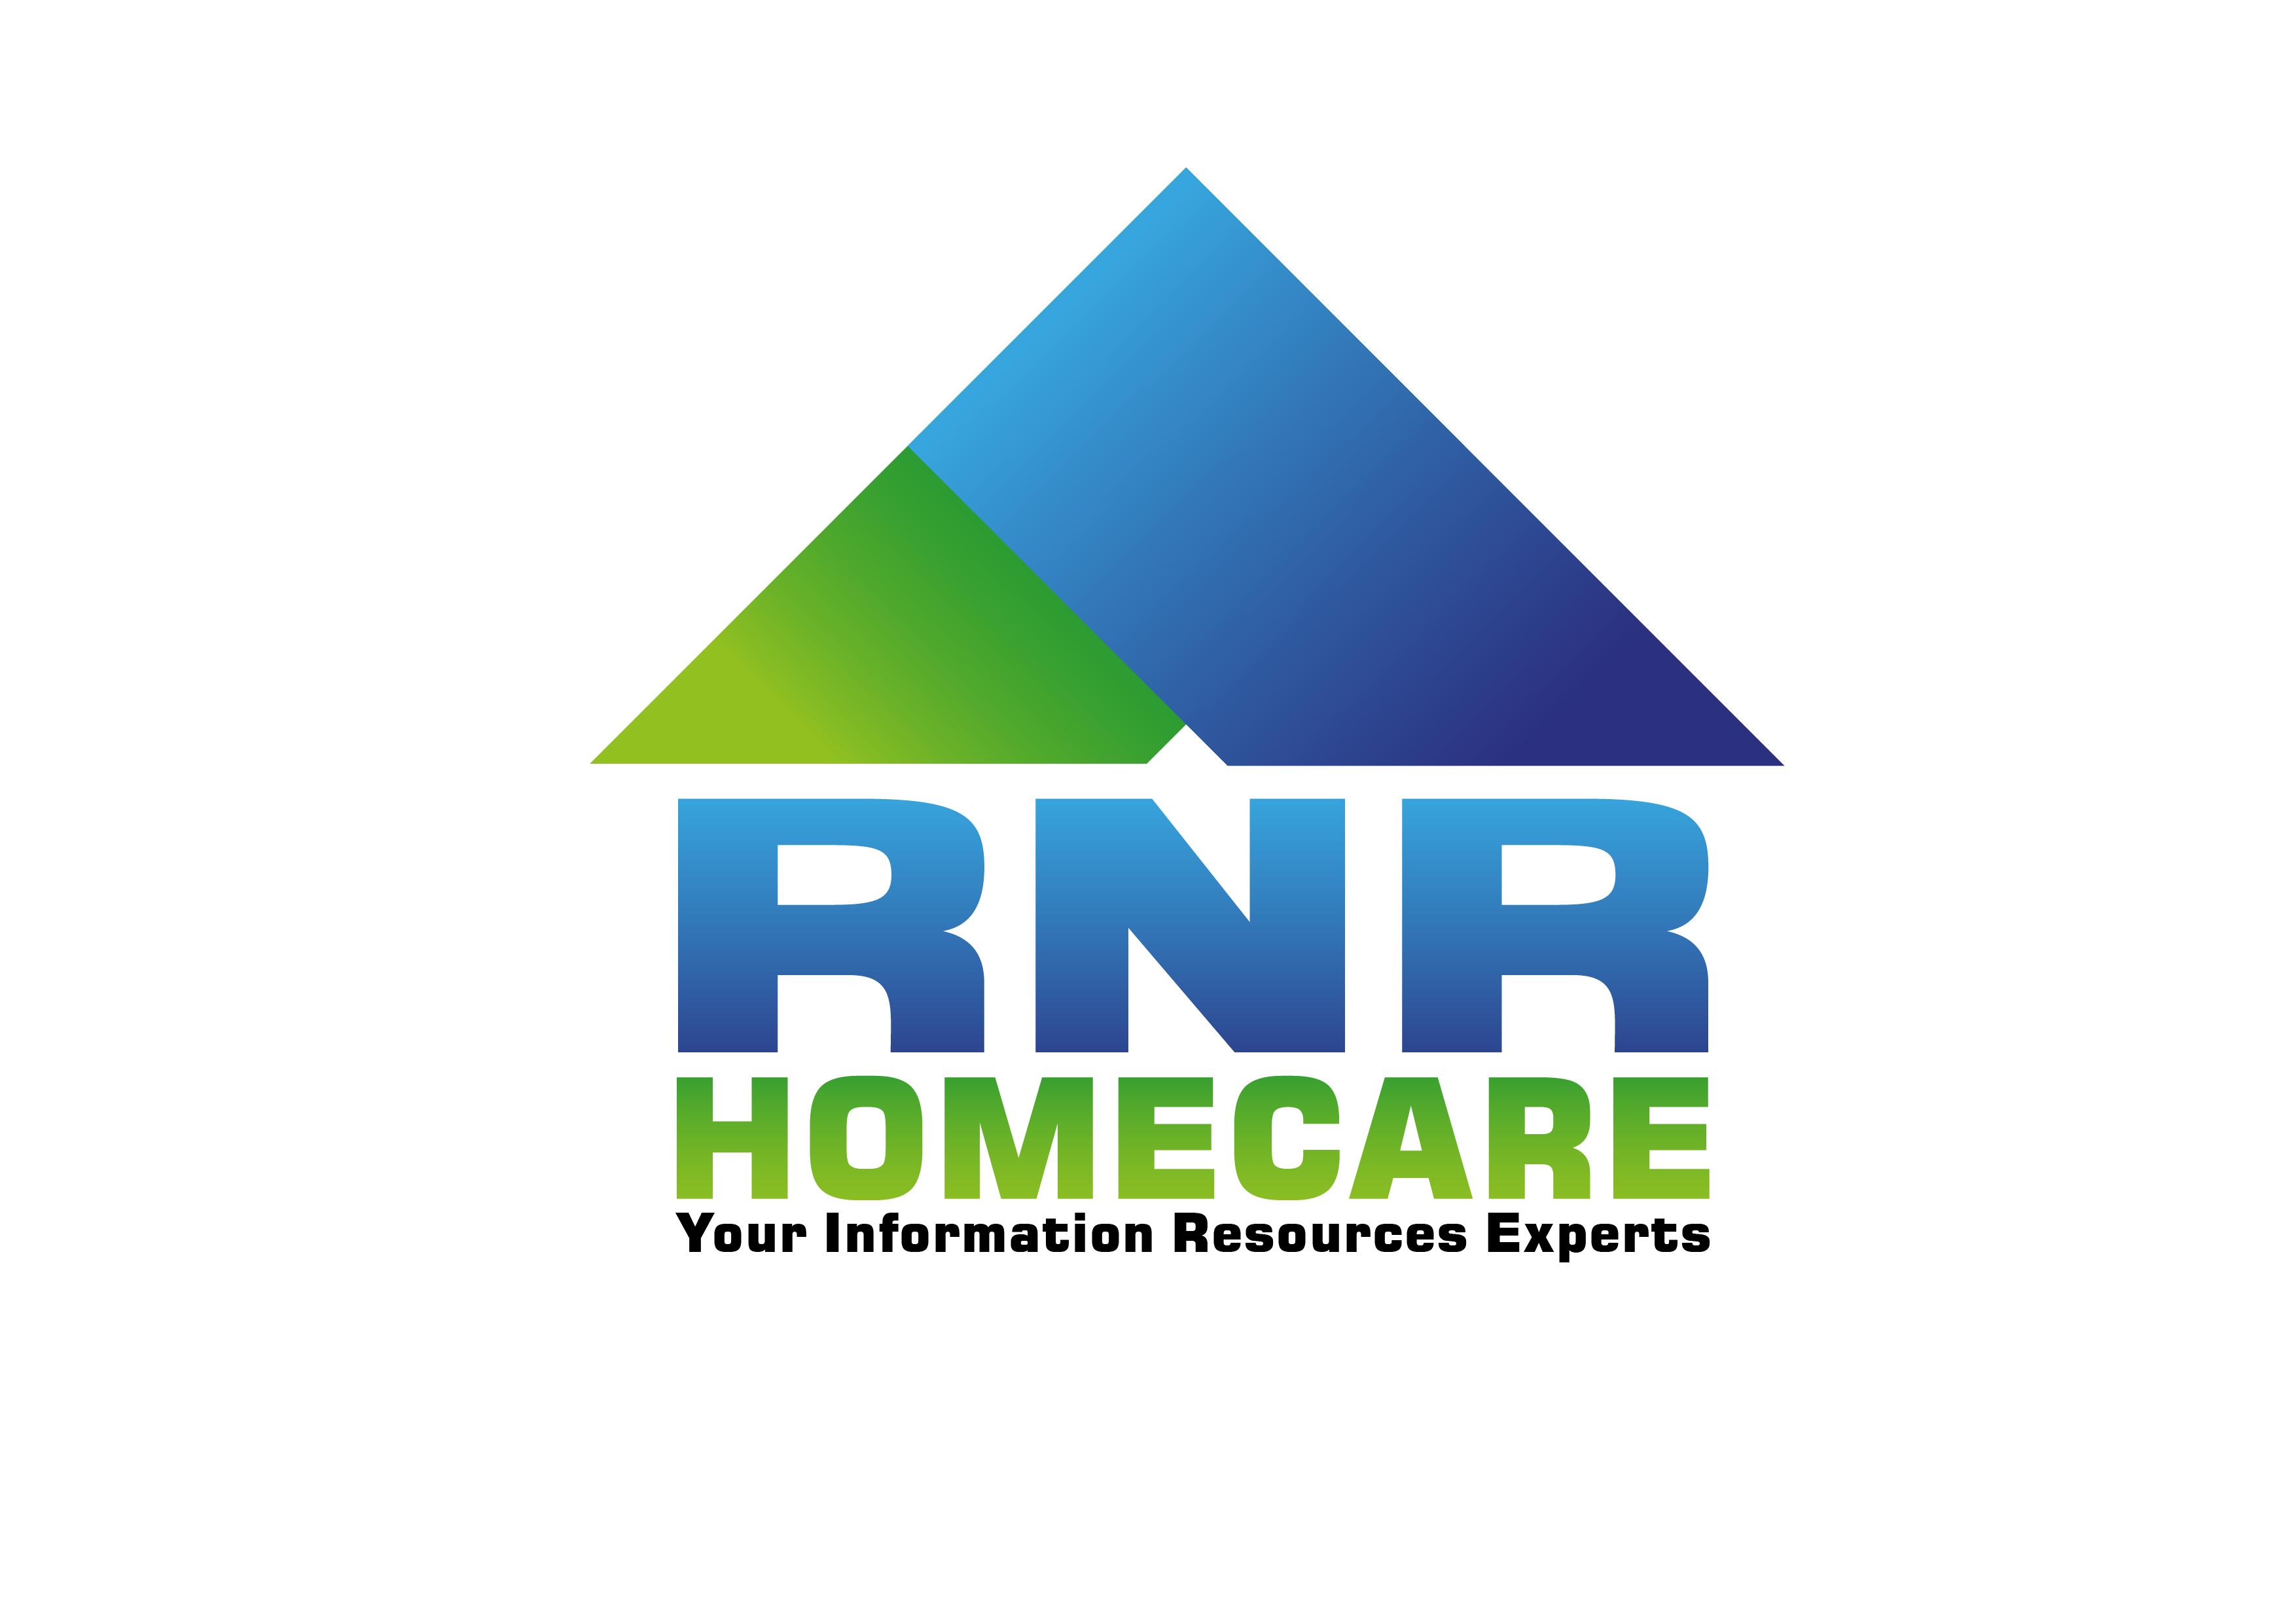 Logo Design by 3draw - Entry No. 66 in the Logo Design Contest Imaginative Logo Design for RNR HomeCare.